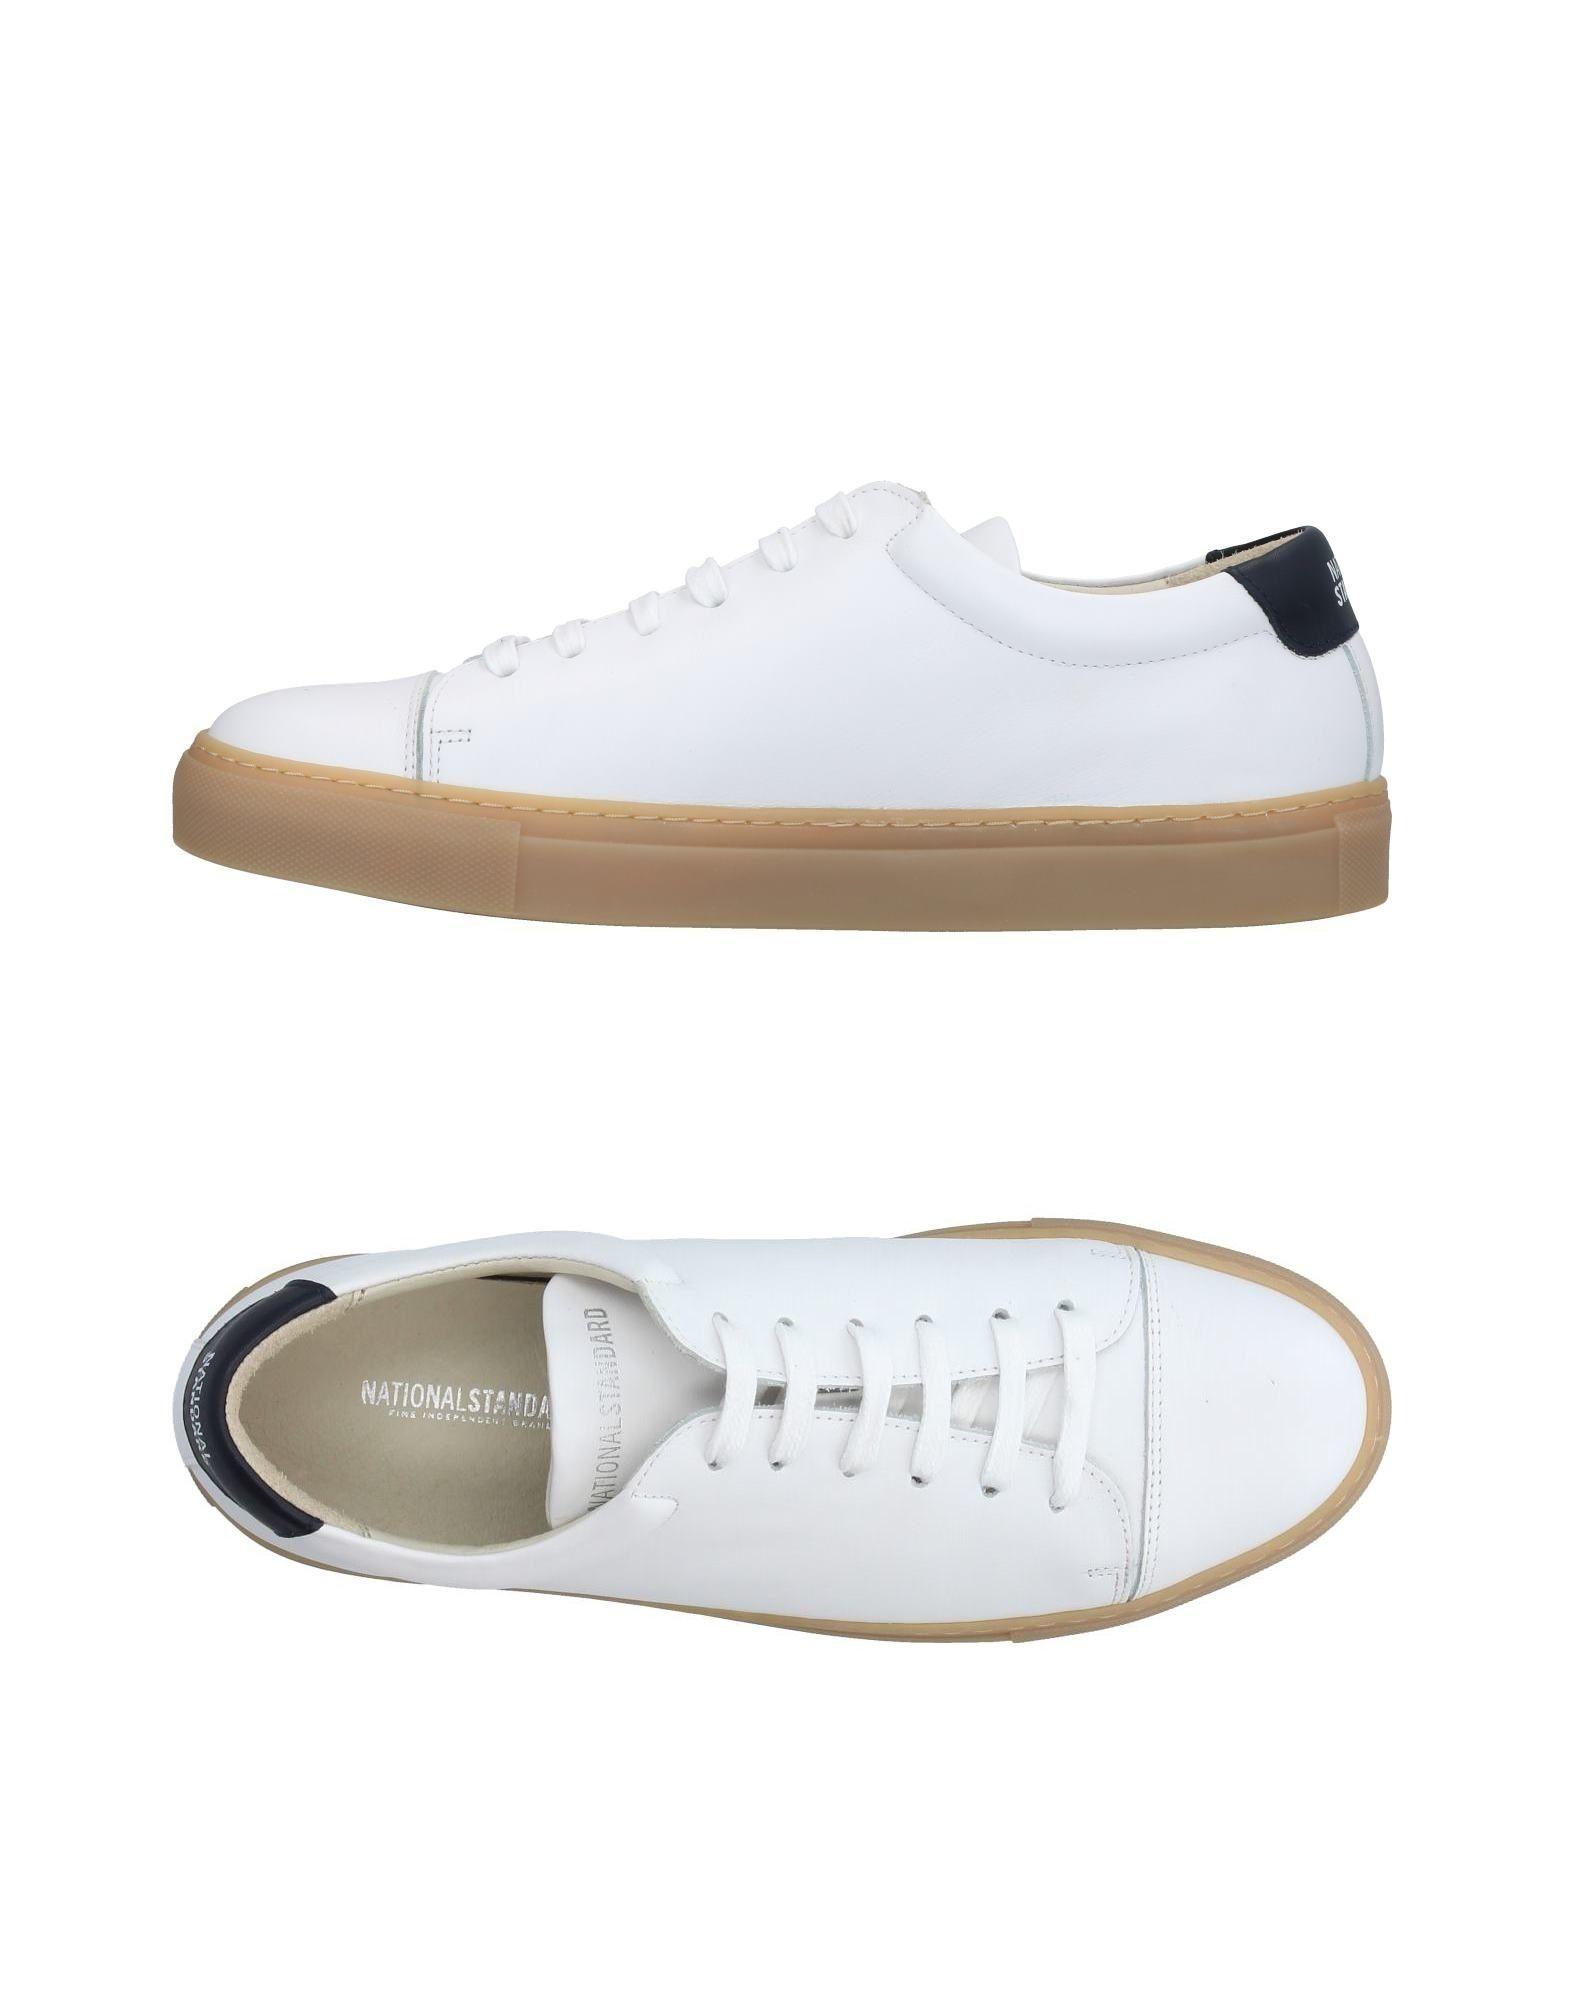 National Standard Sneakers Herren  11374964DN Gute Qualität beliebte Schuhe